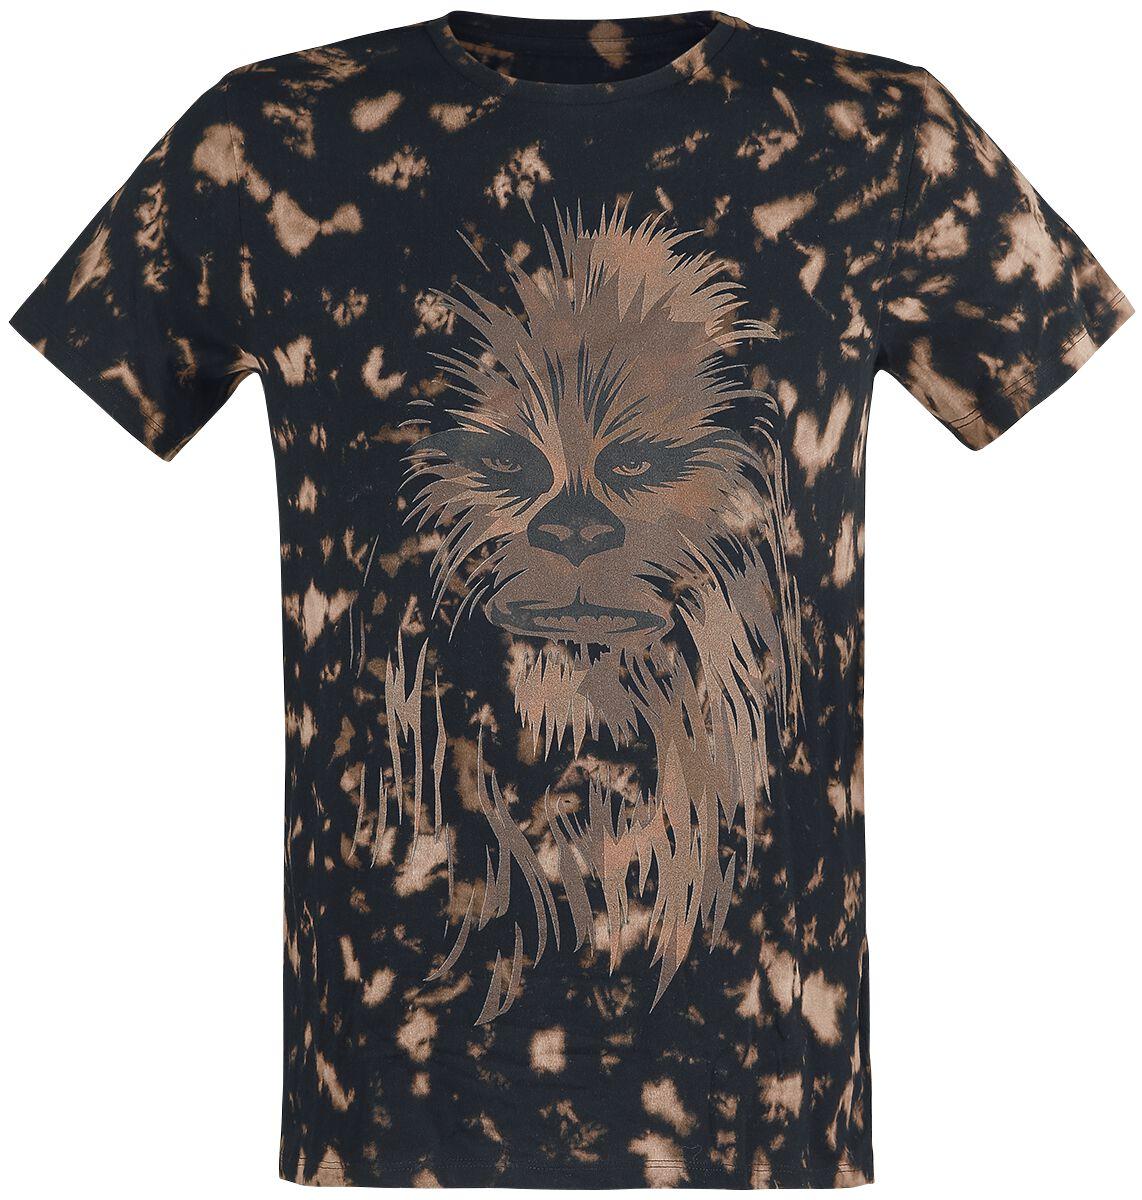 Image of   Star Wars Chewbacca T-Shirt sort-brun